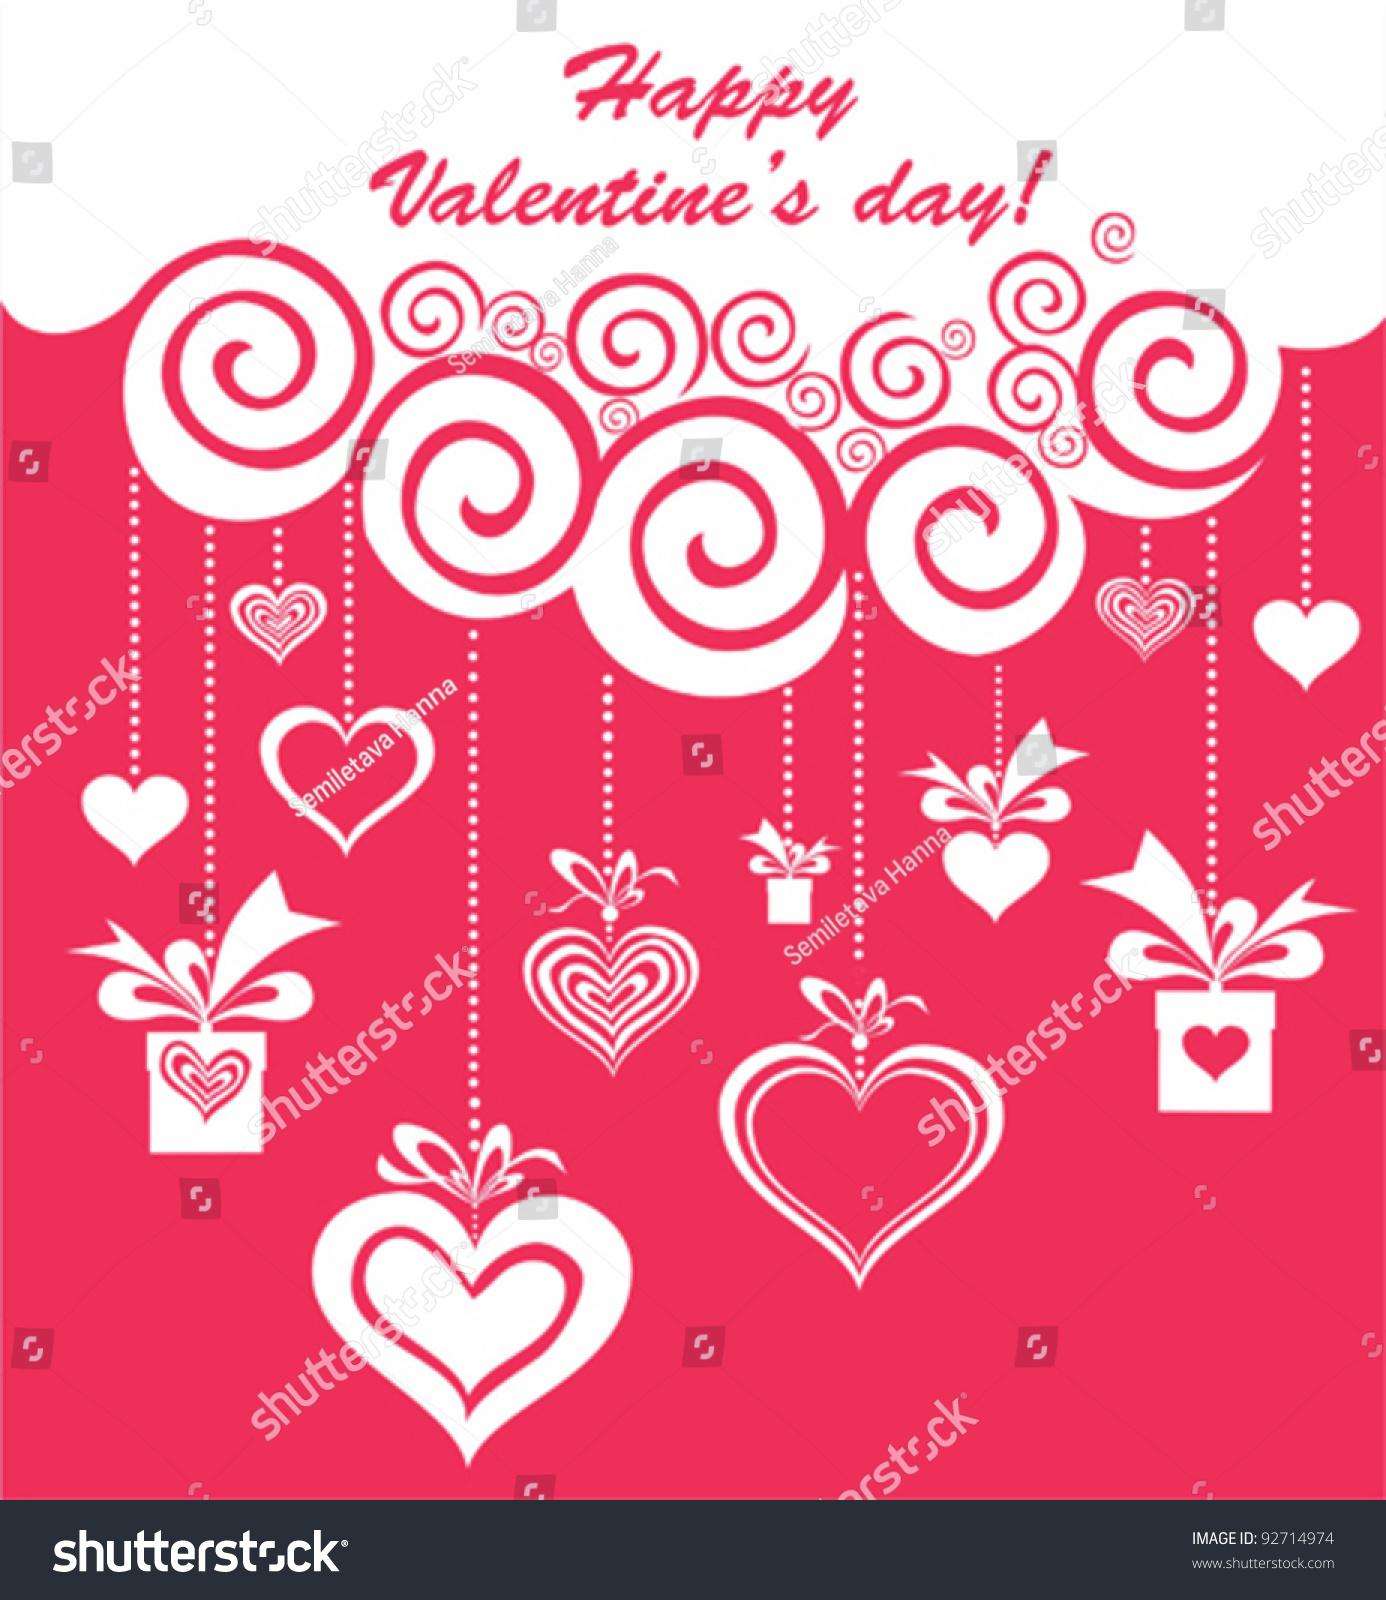 Valentines Day Card Design Celebration Background Vector – Valentines Day Card Design